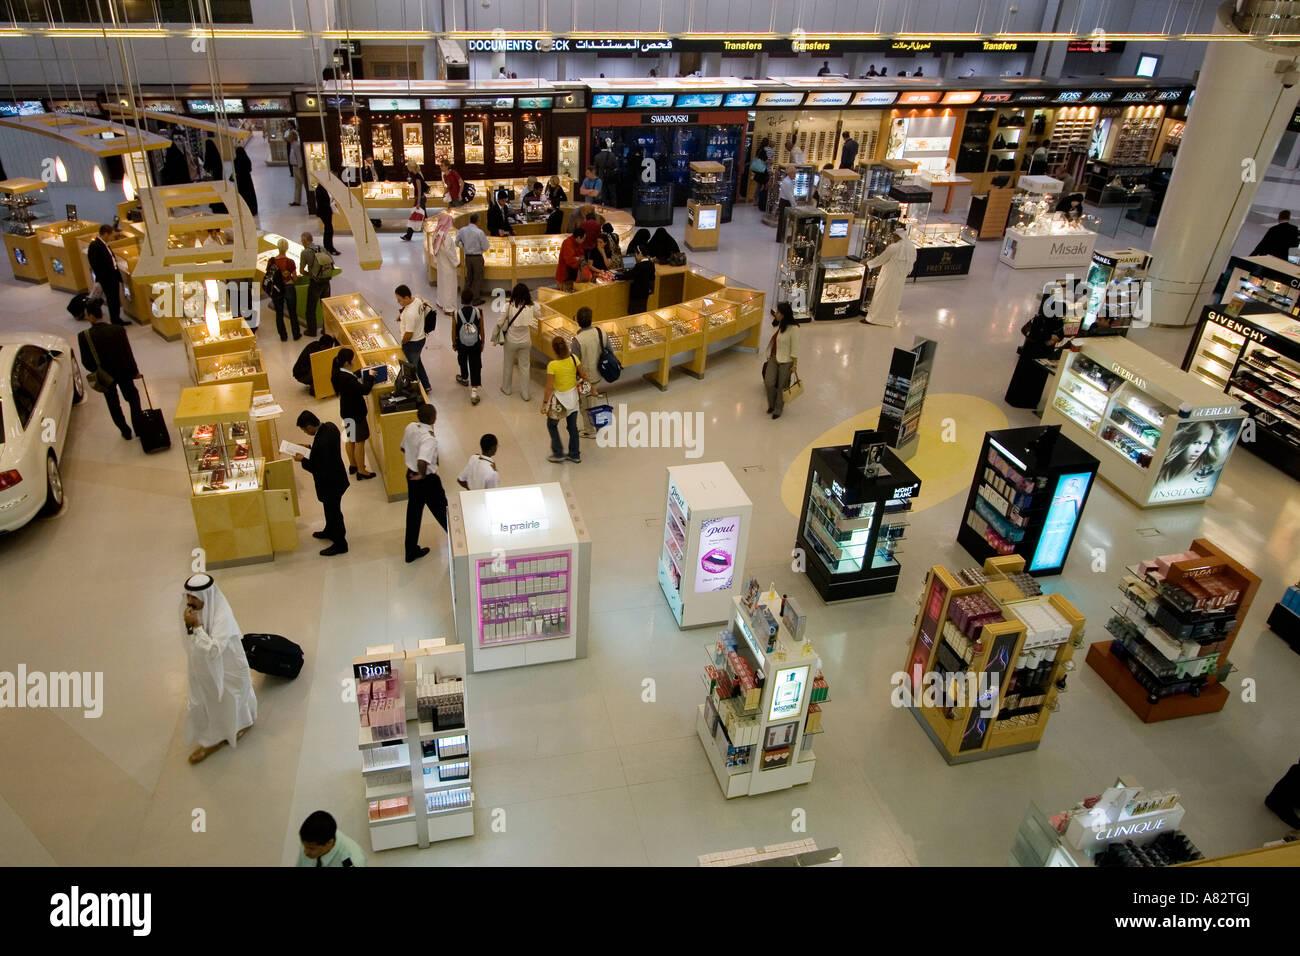 53b403c708fc Qatar Doha airport duty free shopping Stock Photo  11968961 - Alamy